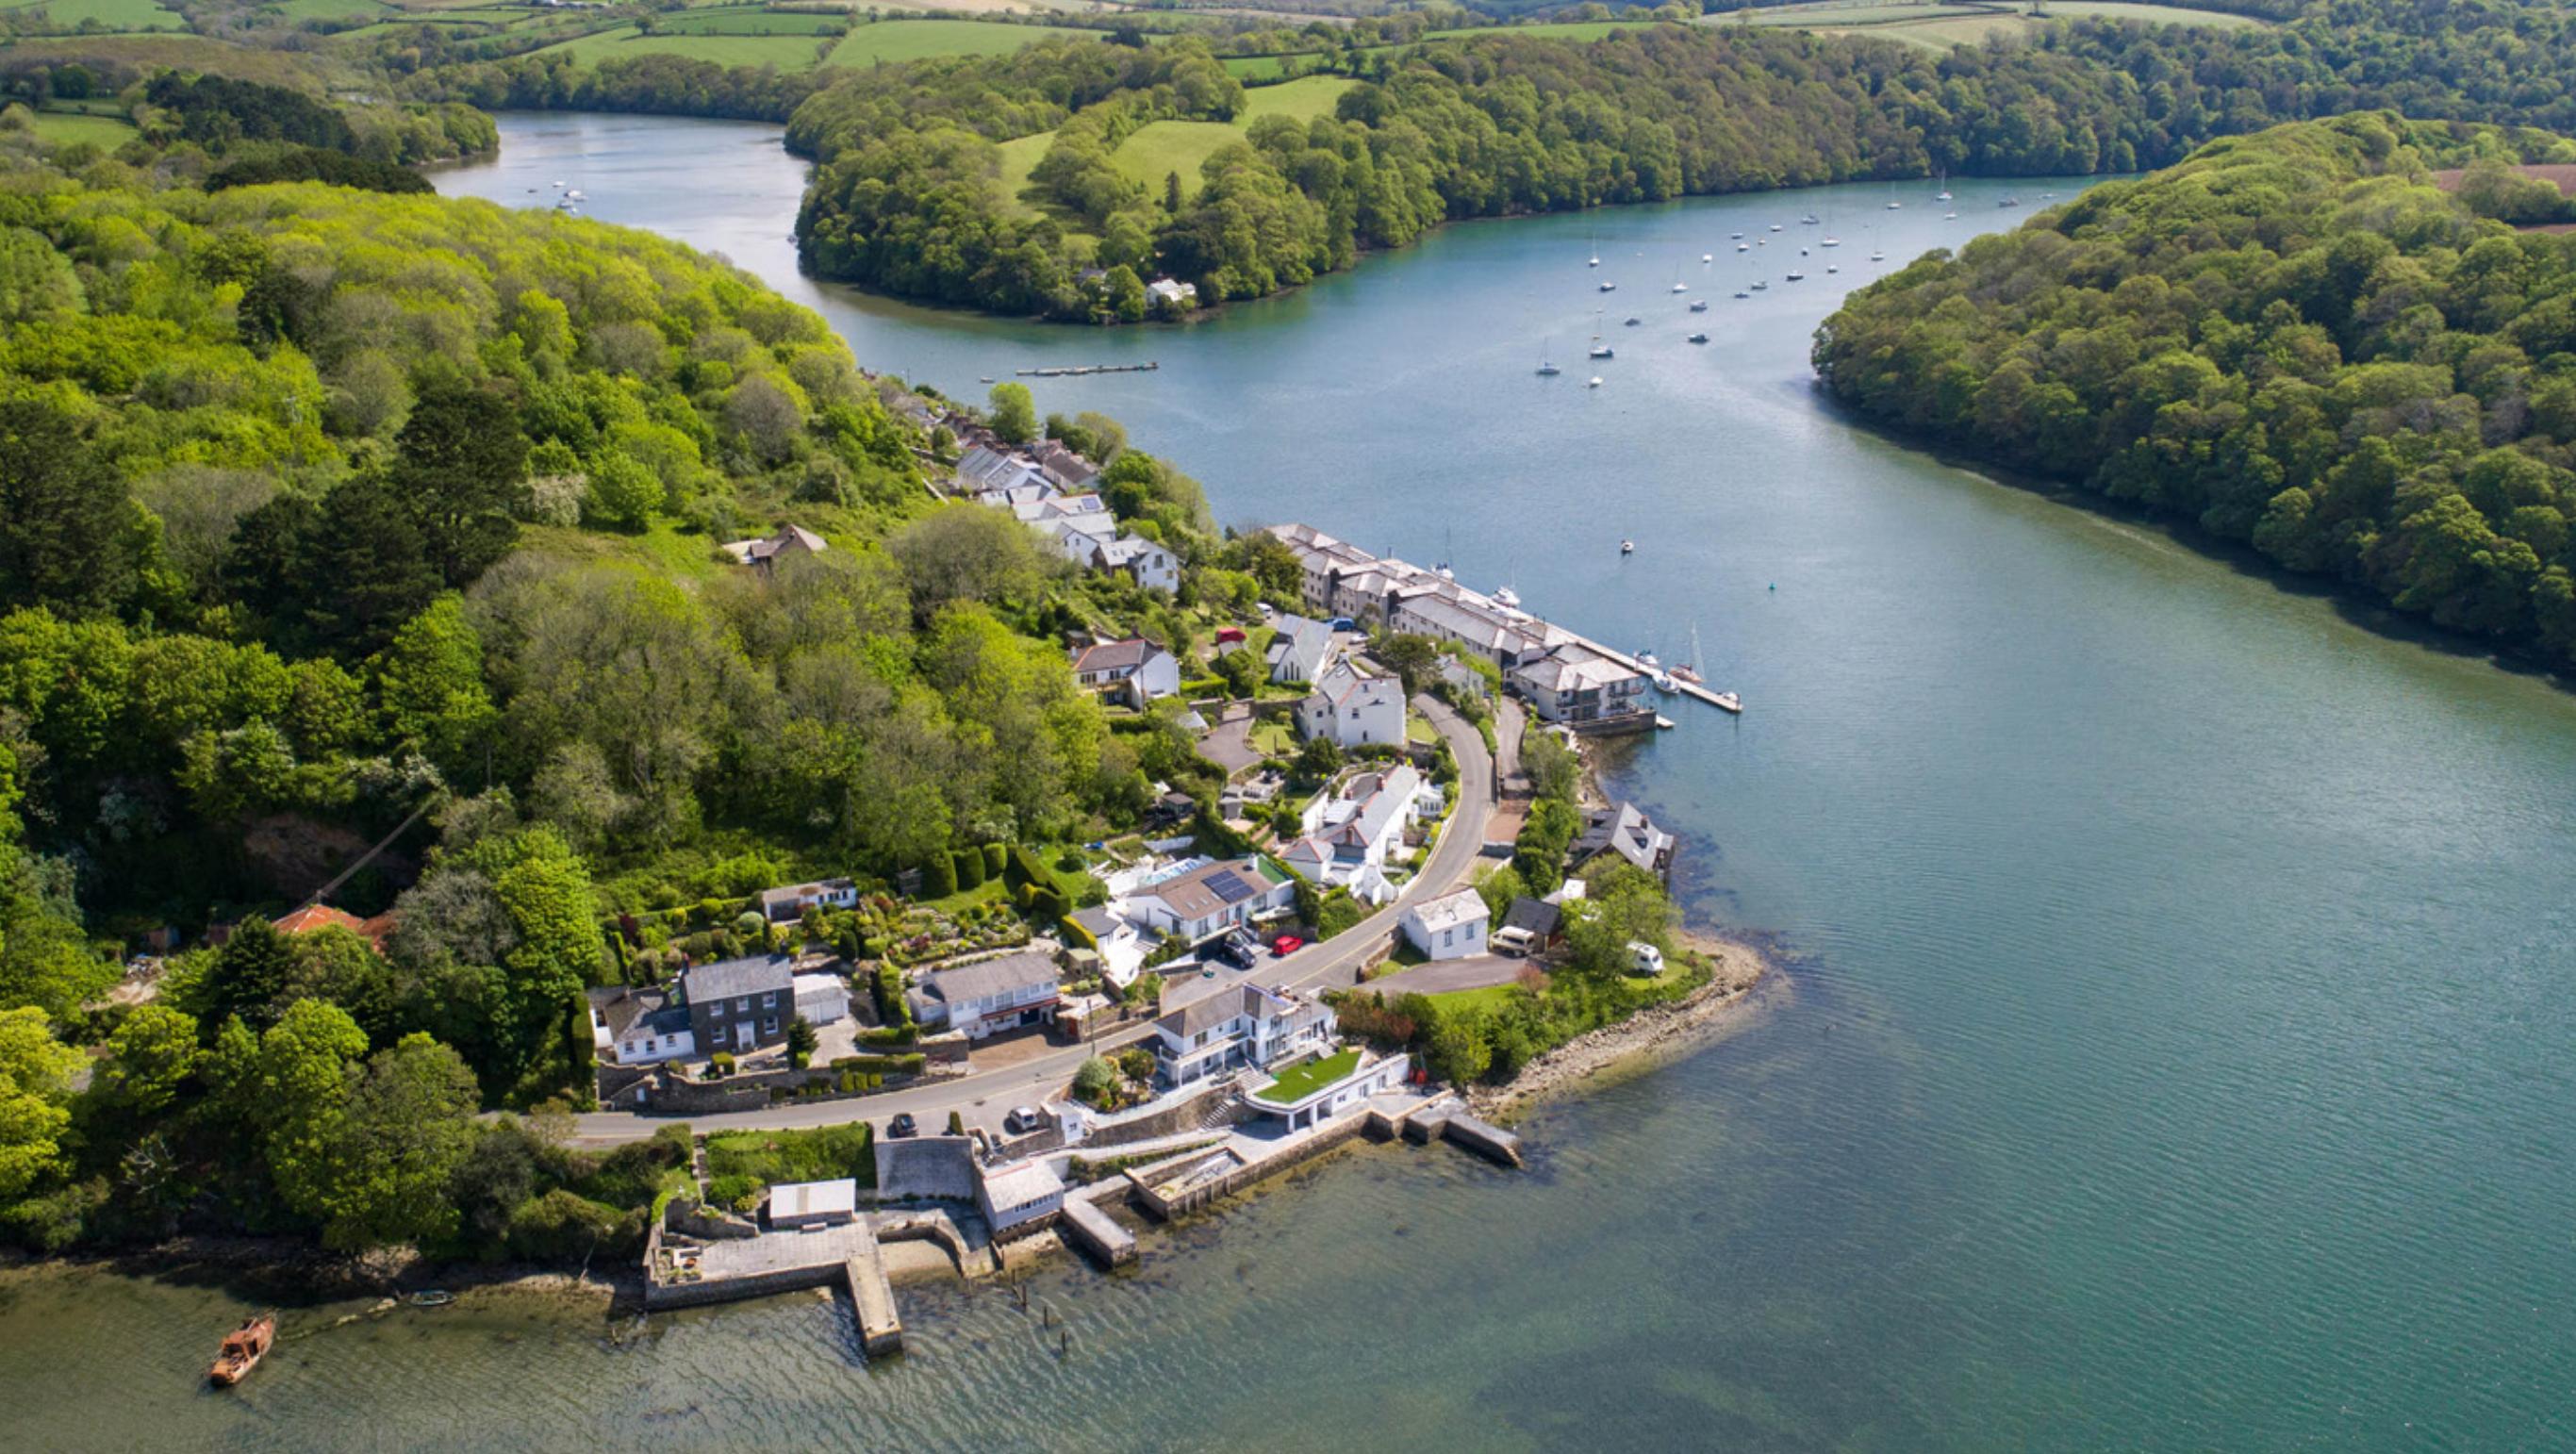 Drone Photo of Malpas Cornwall